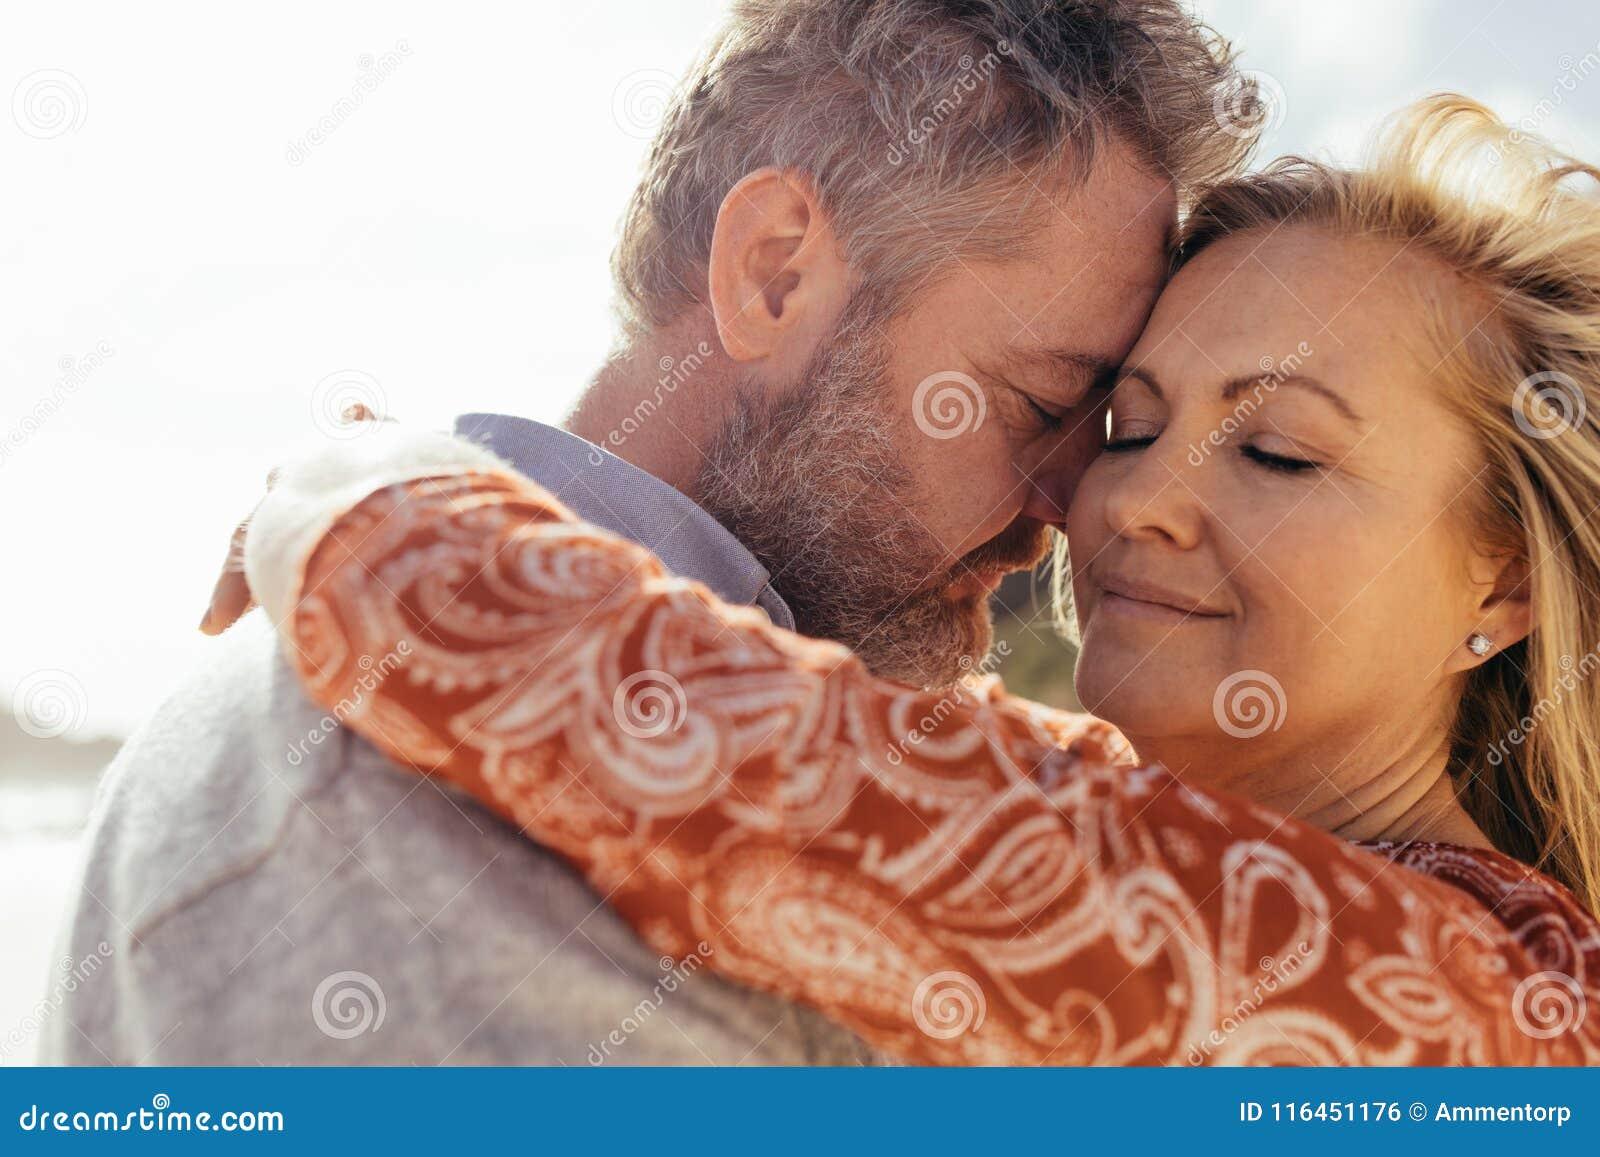 Mature women loving together